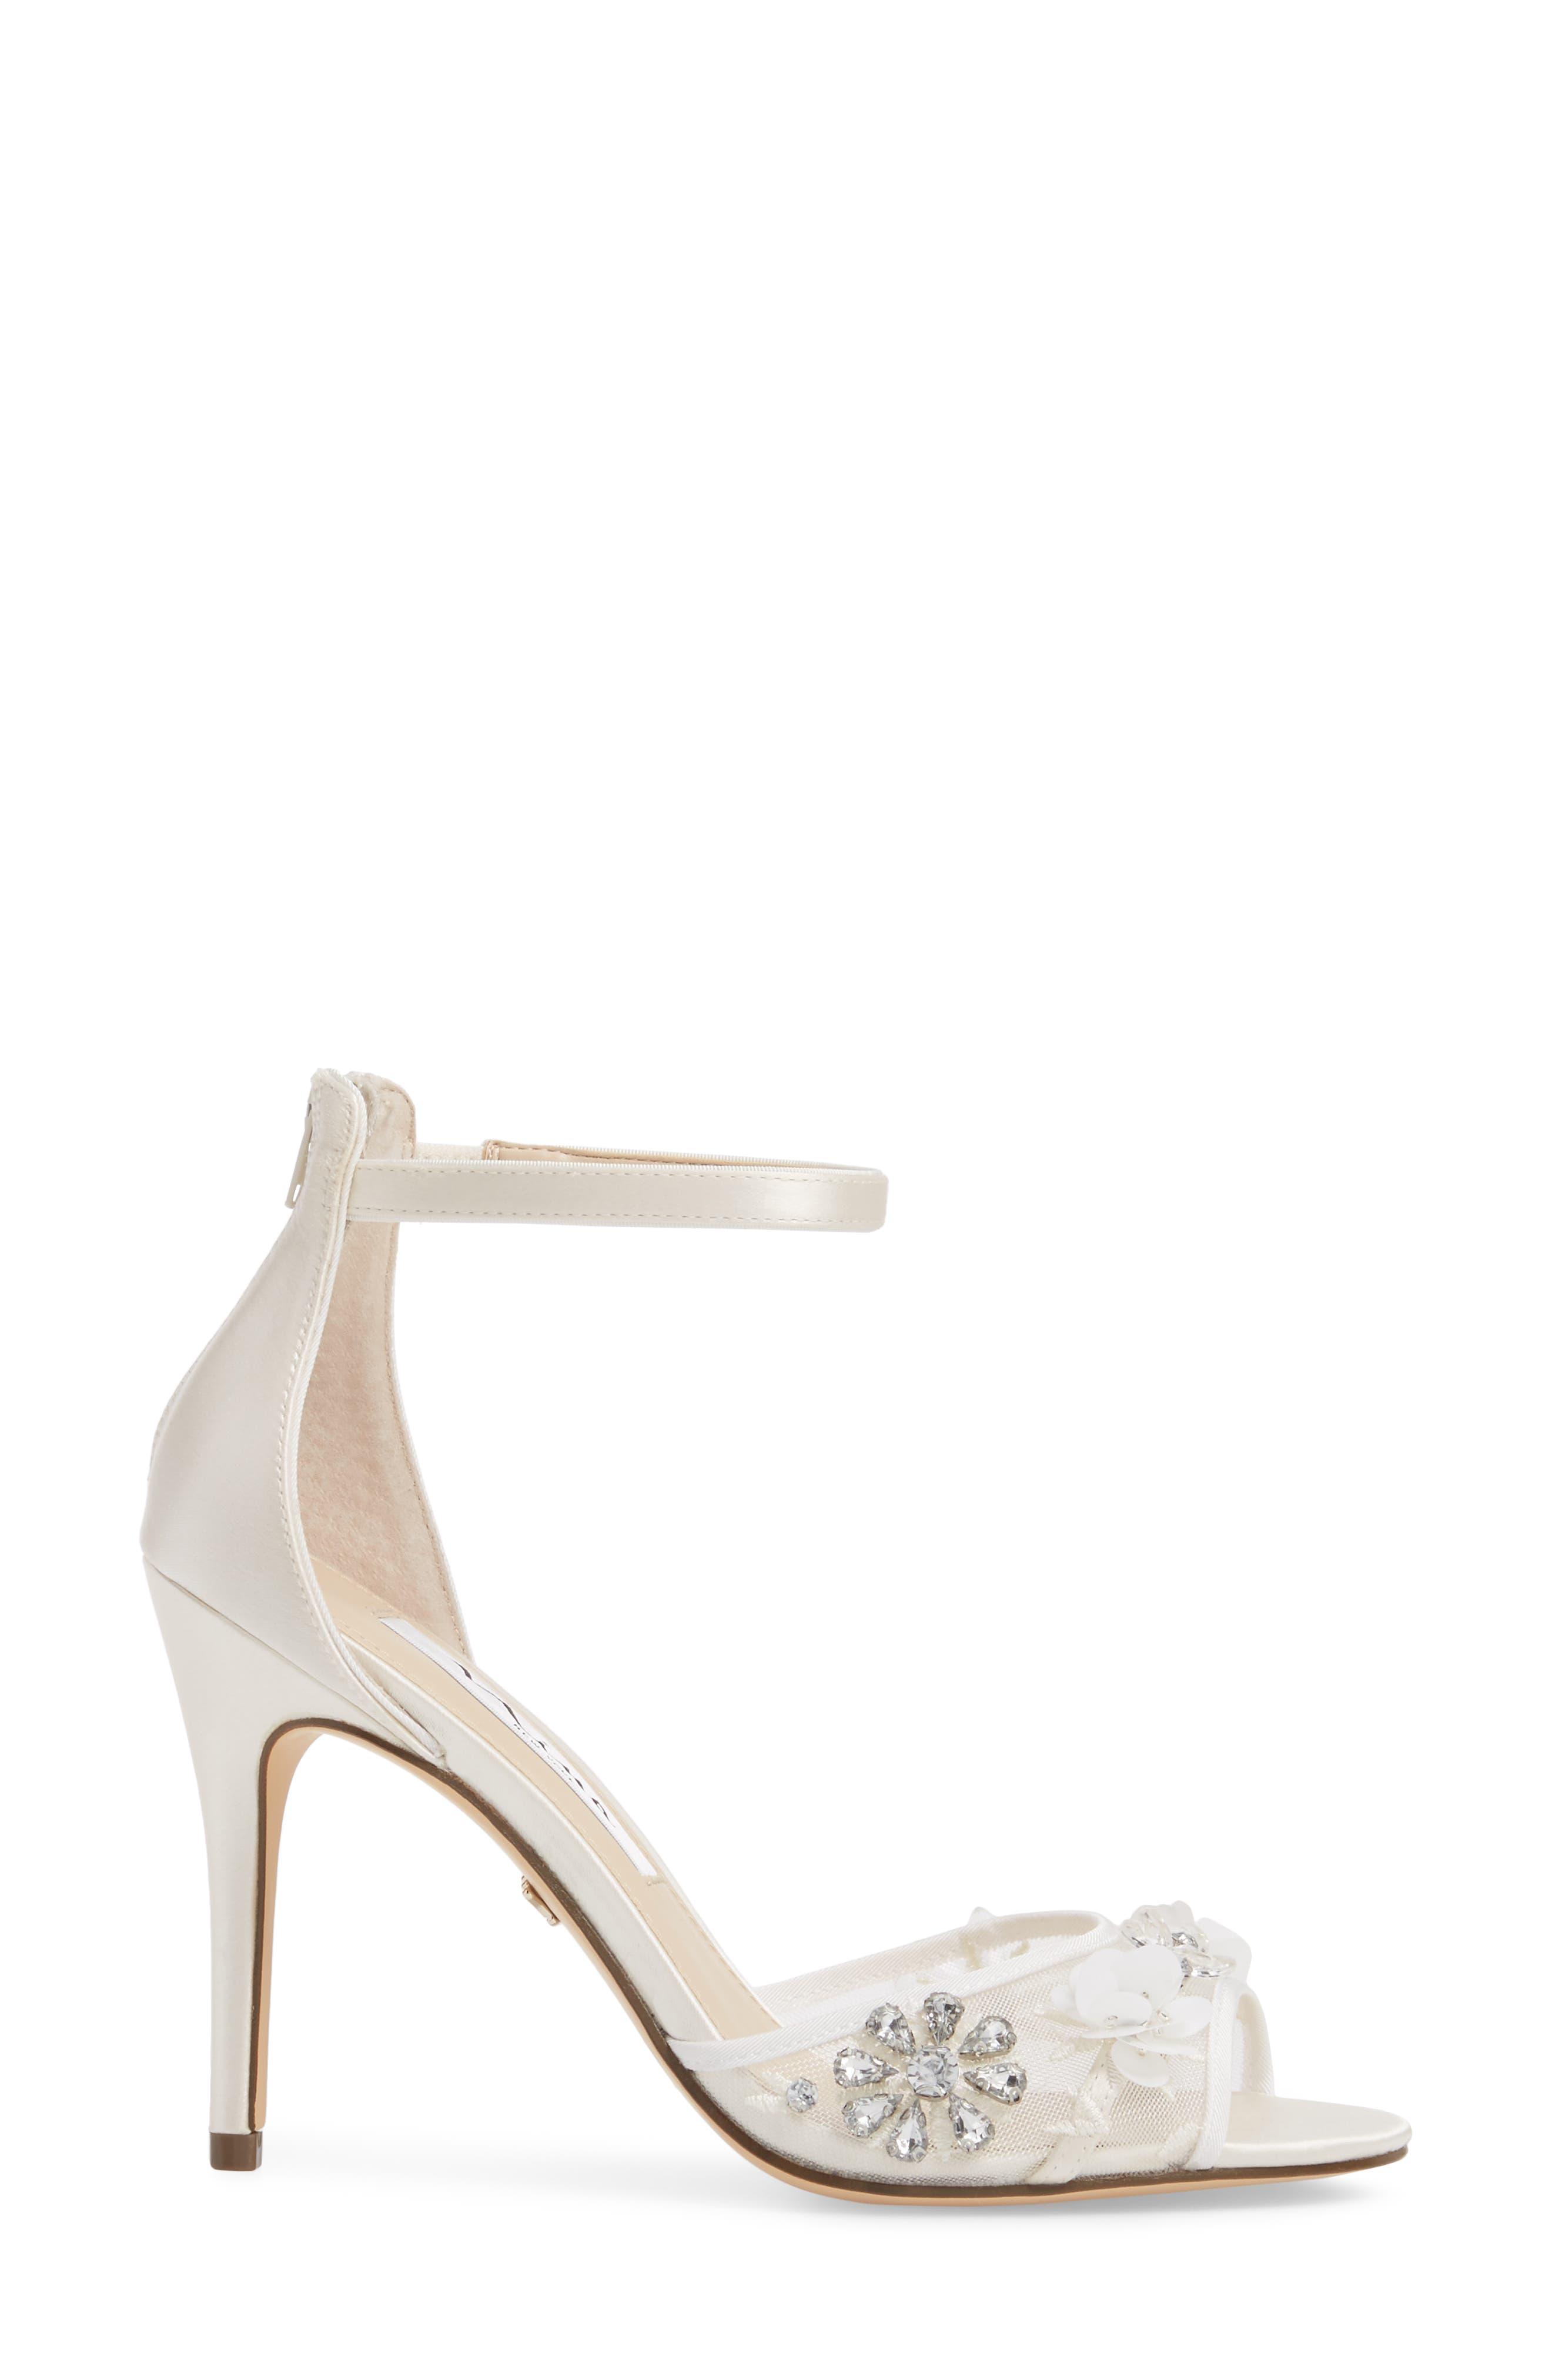 Clarity Ankle Strap Sandal,                             Alternate thumbnail 3, color,                             IVORY SATIN